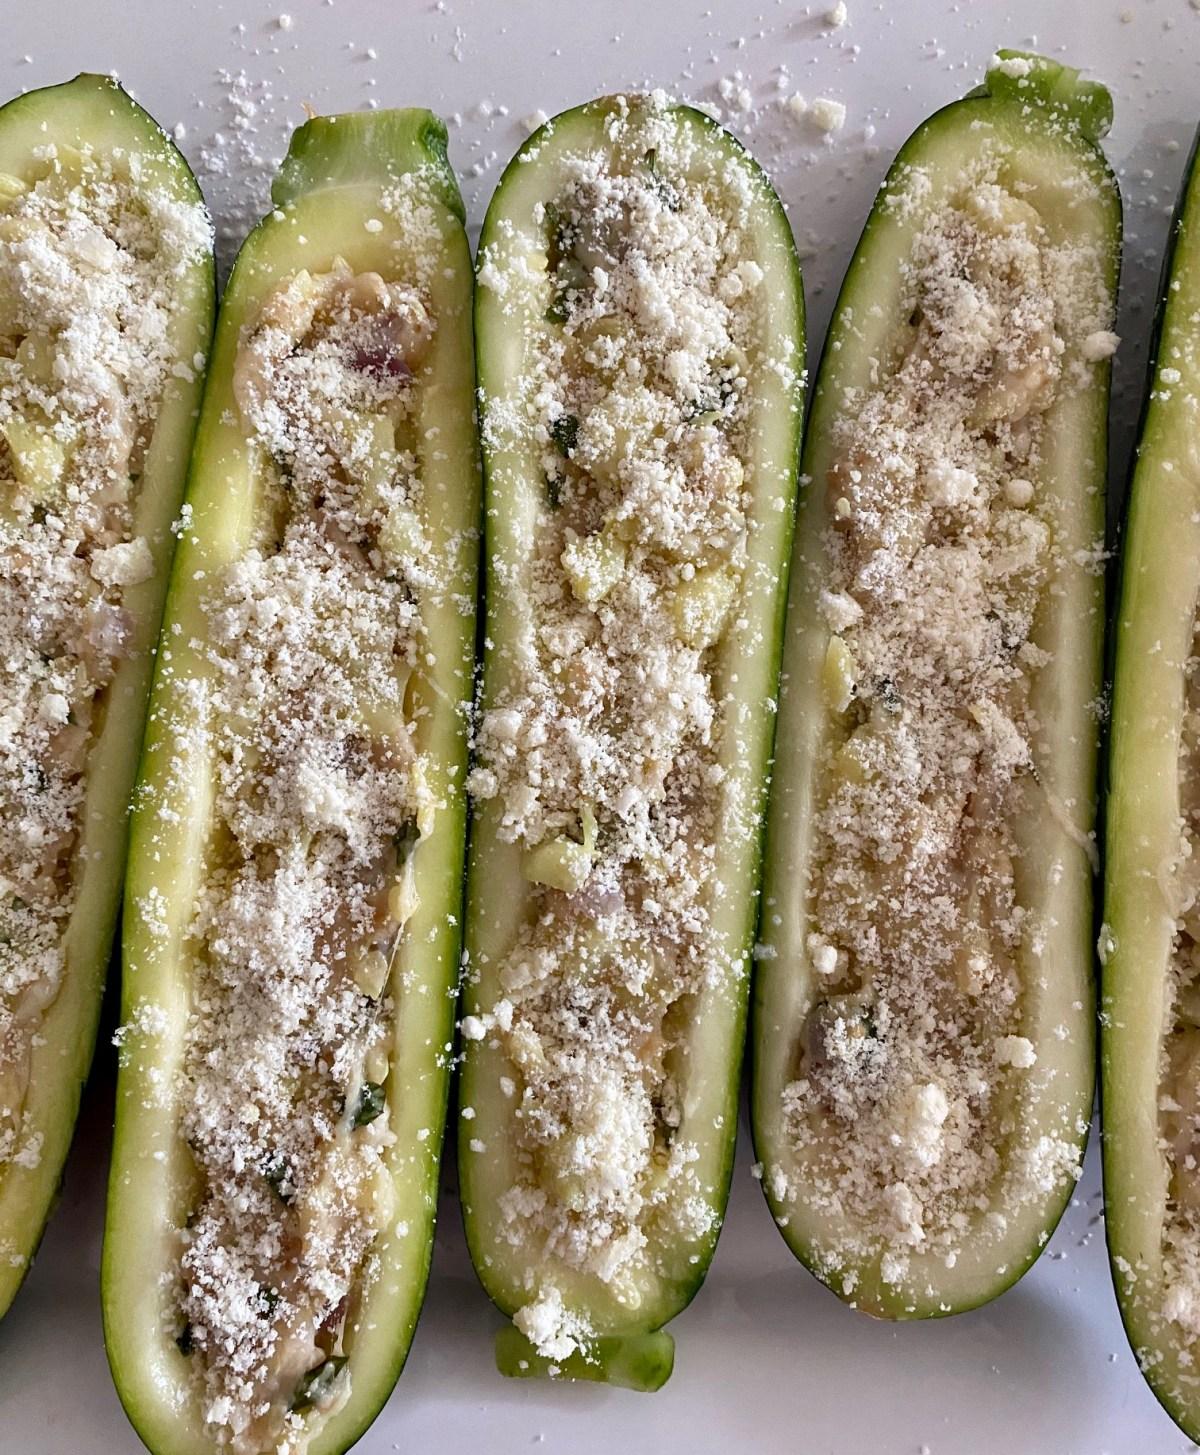 Zucchini boats stuffed with zucchini mixture and sprinkled with Parmesan cheese. #zucchini #howtocookzuchini #howtogrillzucchini #zucchinionthegrill #stuffedzucchini